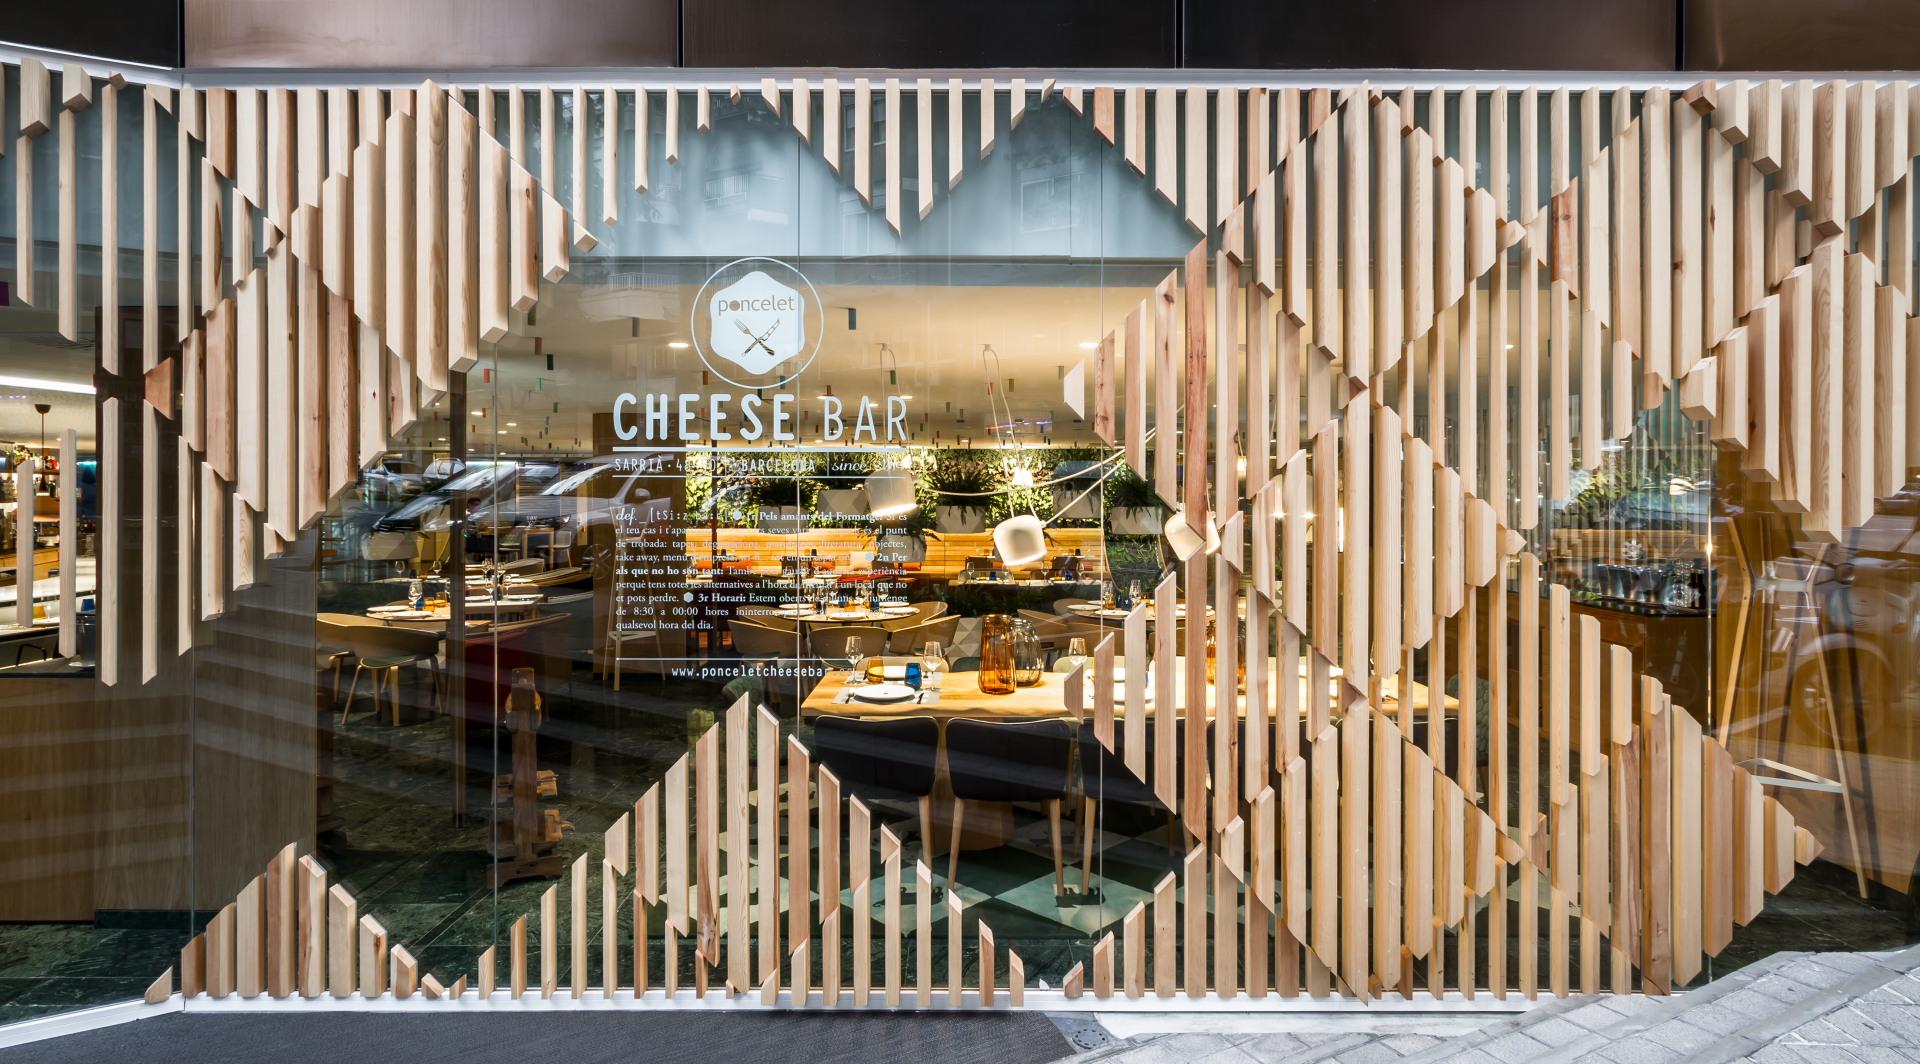 fotografia-arquitectura-valencia-german-cabo-estudihac-poncelet-cheese-bar-barcelona (2)